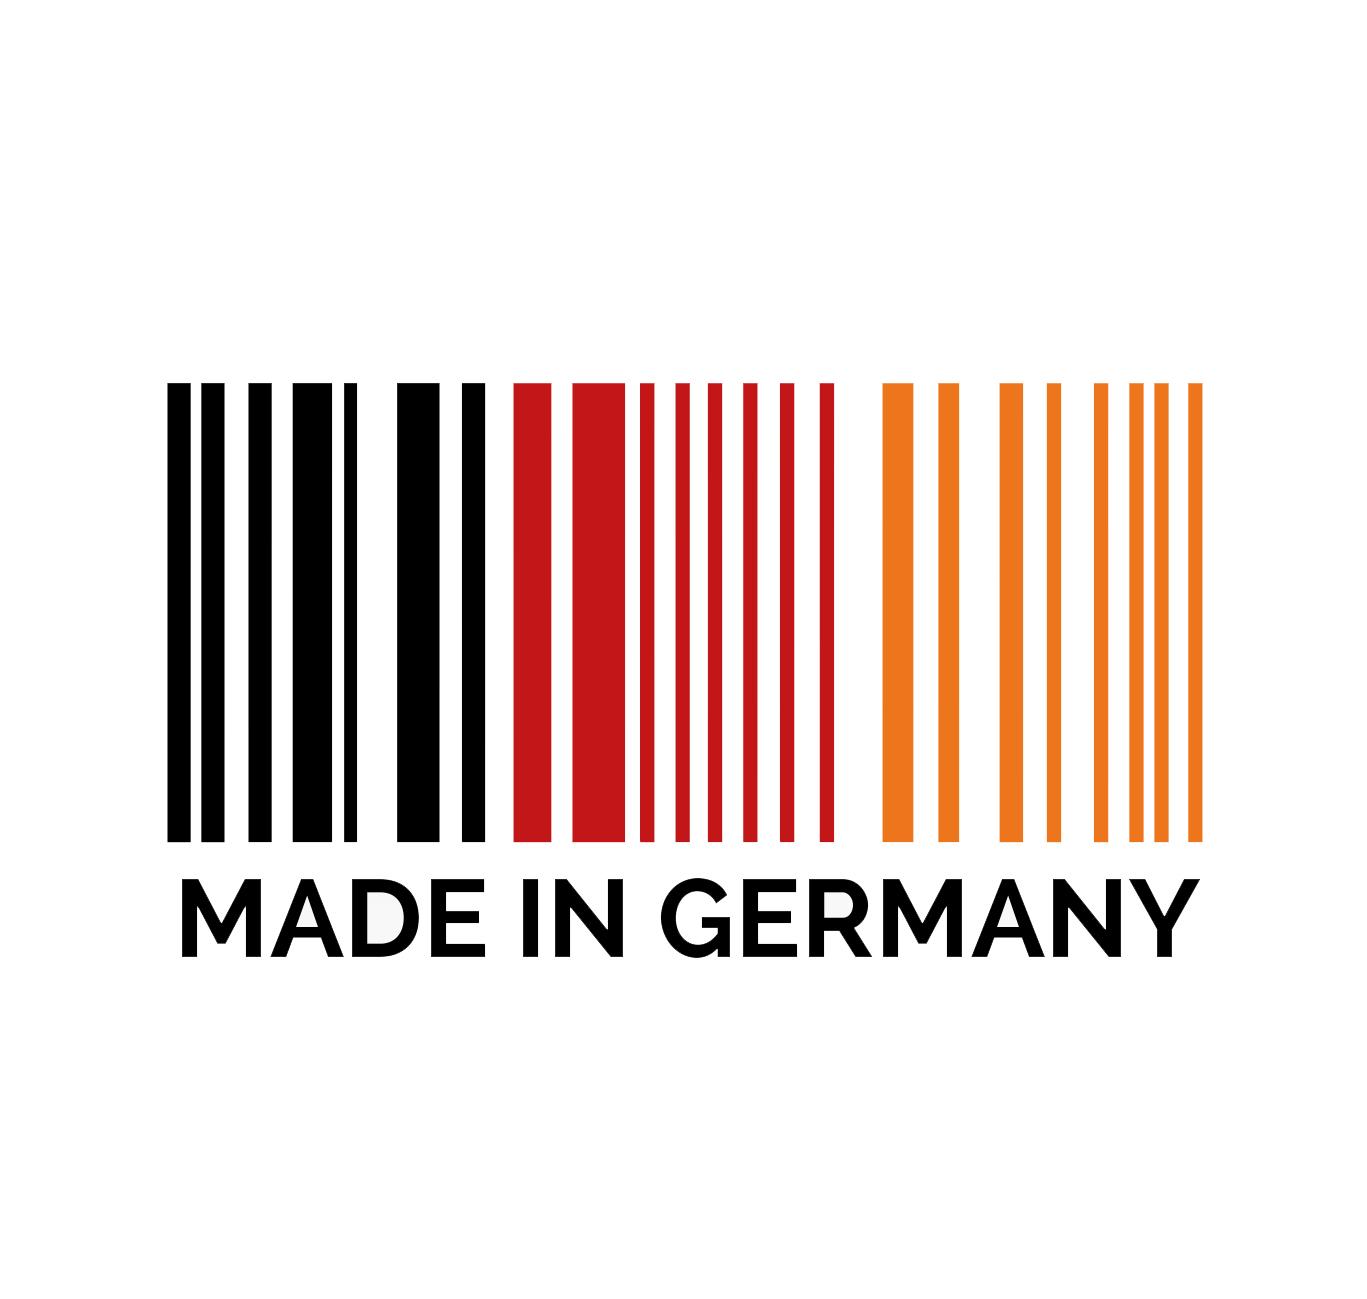 Steckdose Aufkleber - FUN Fake täuschend echte Steckdosen Optik 8x8 cm